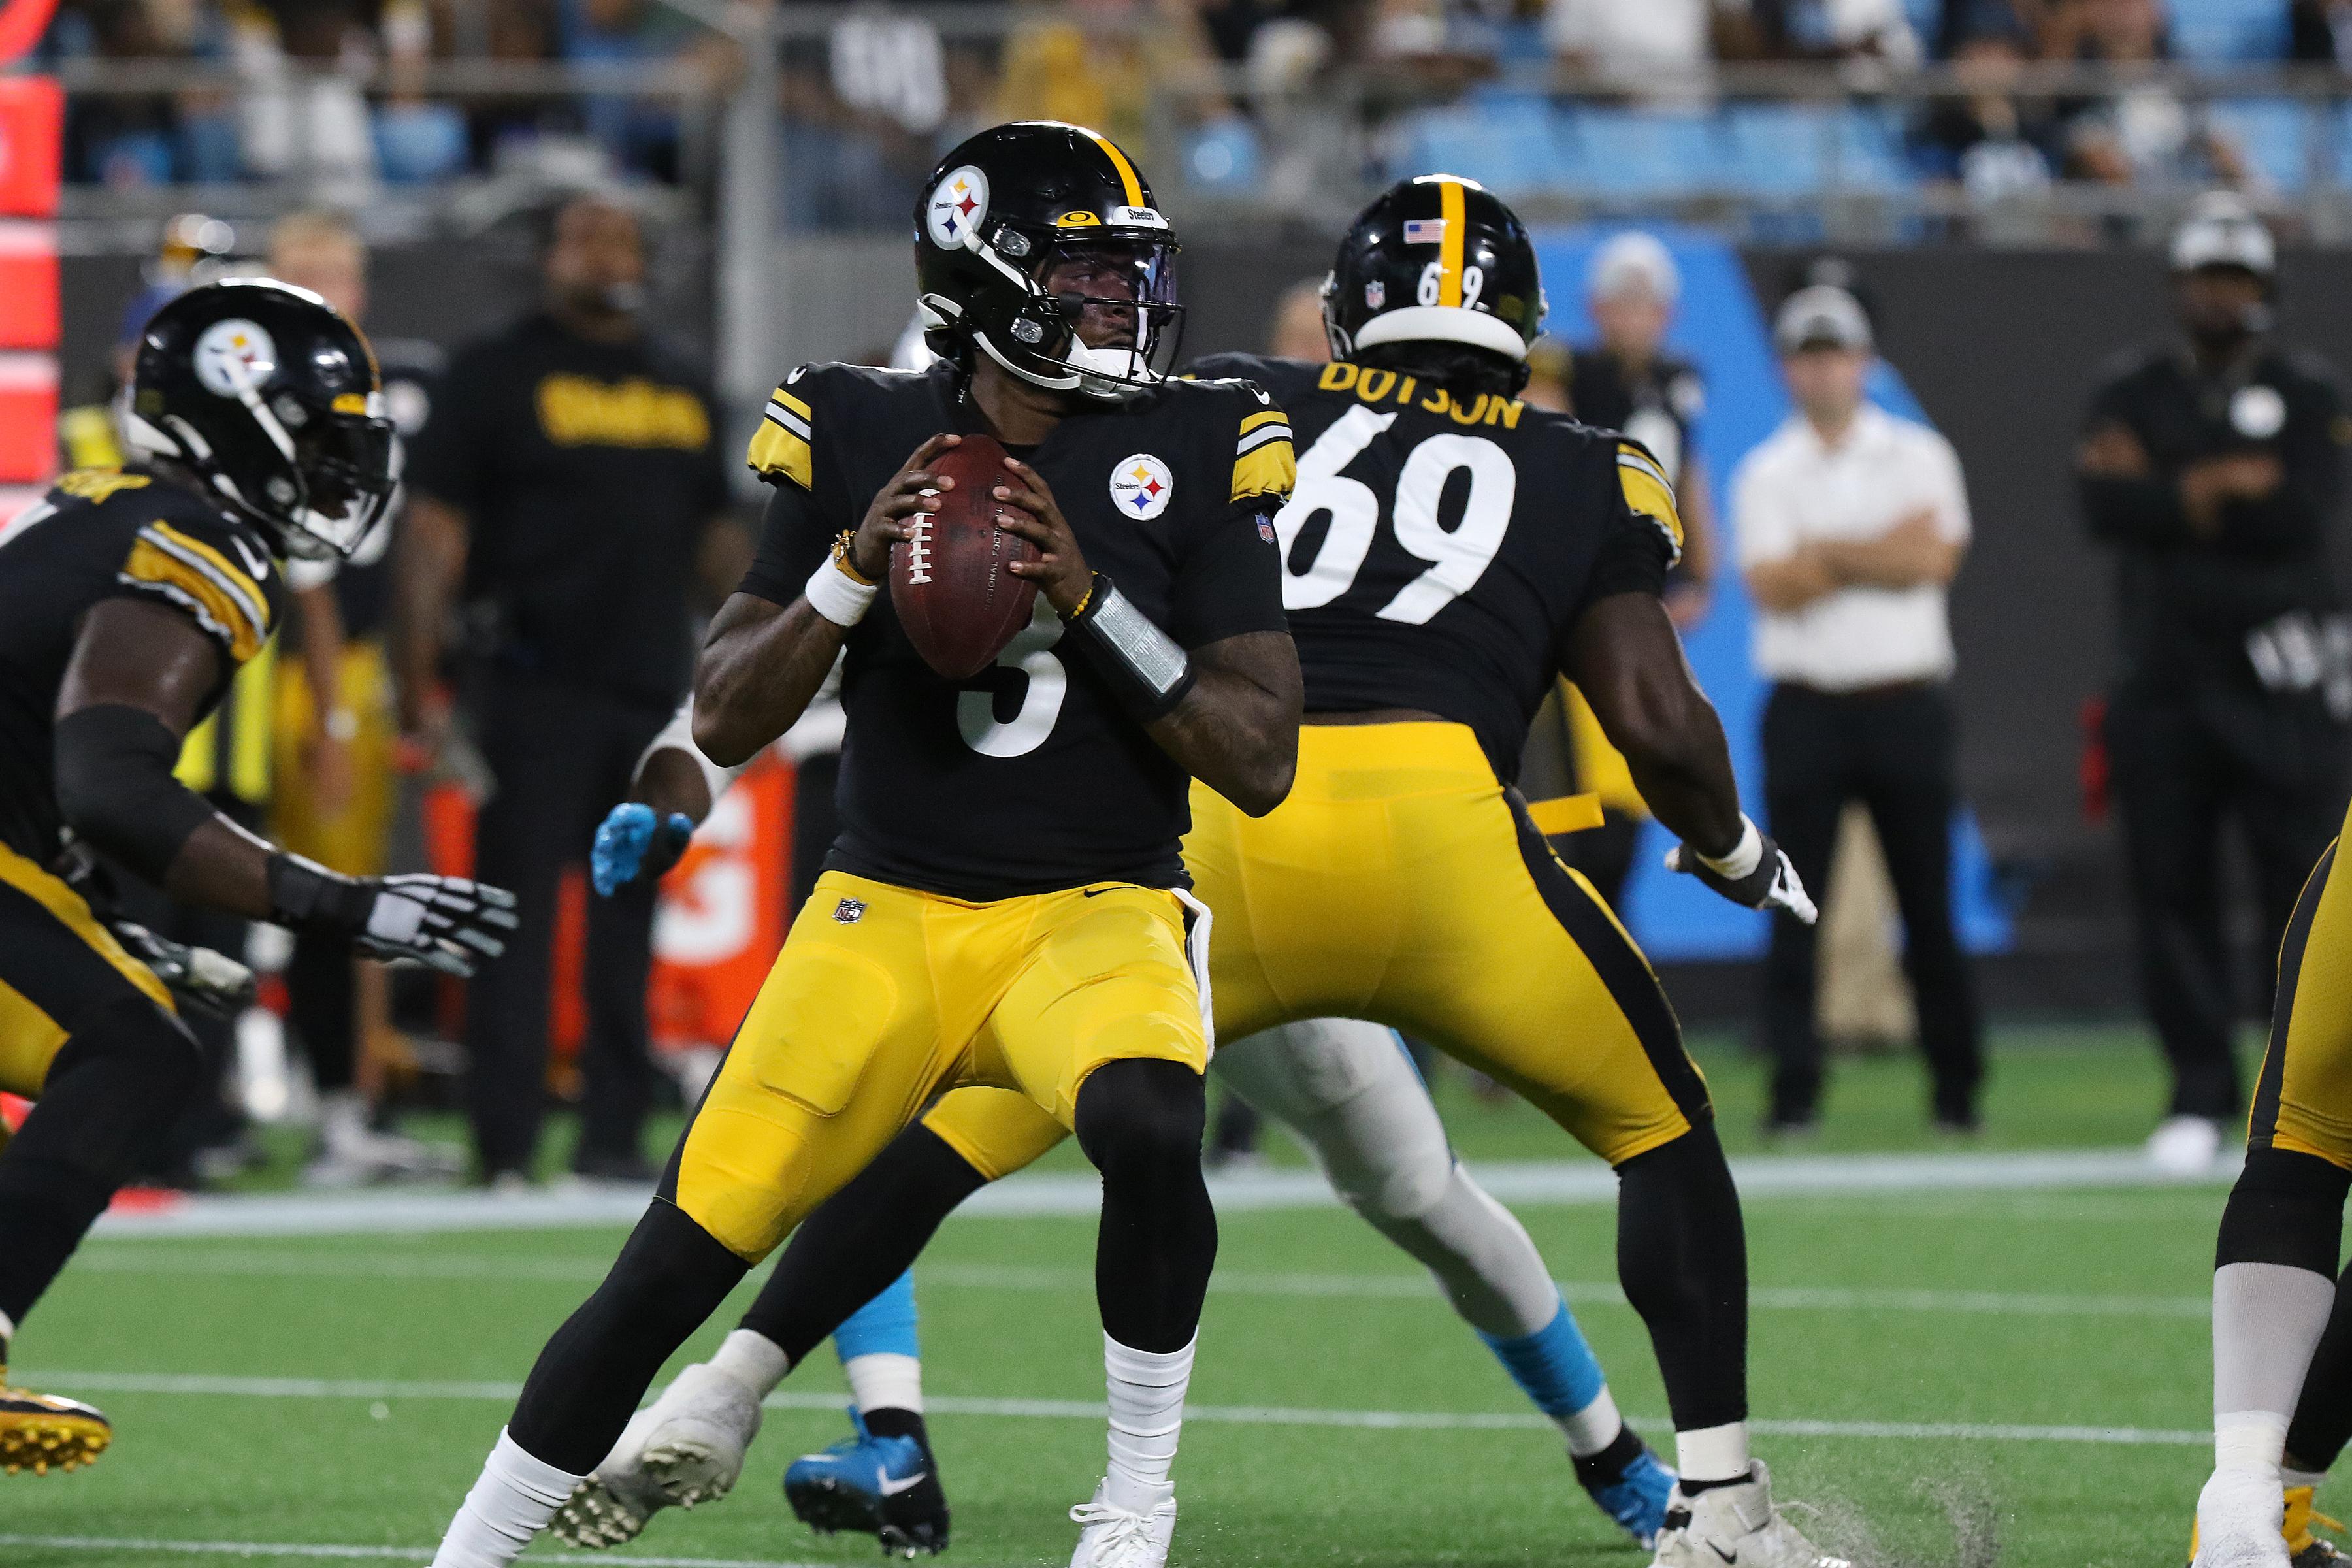 NFL: AUG 27 Preseason - Steelers at Panthers